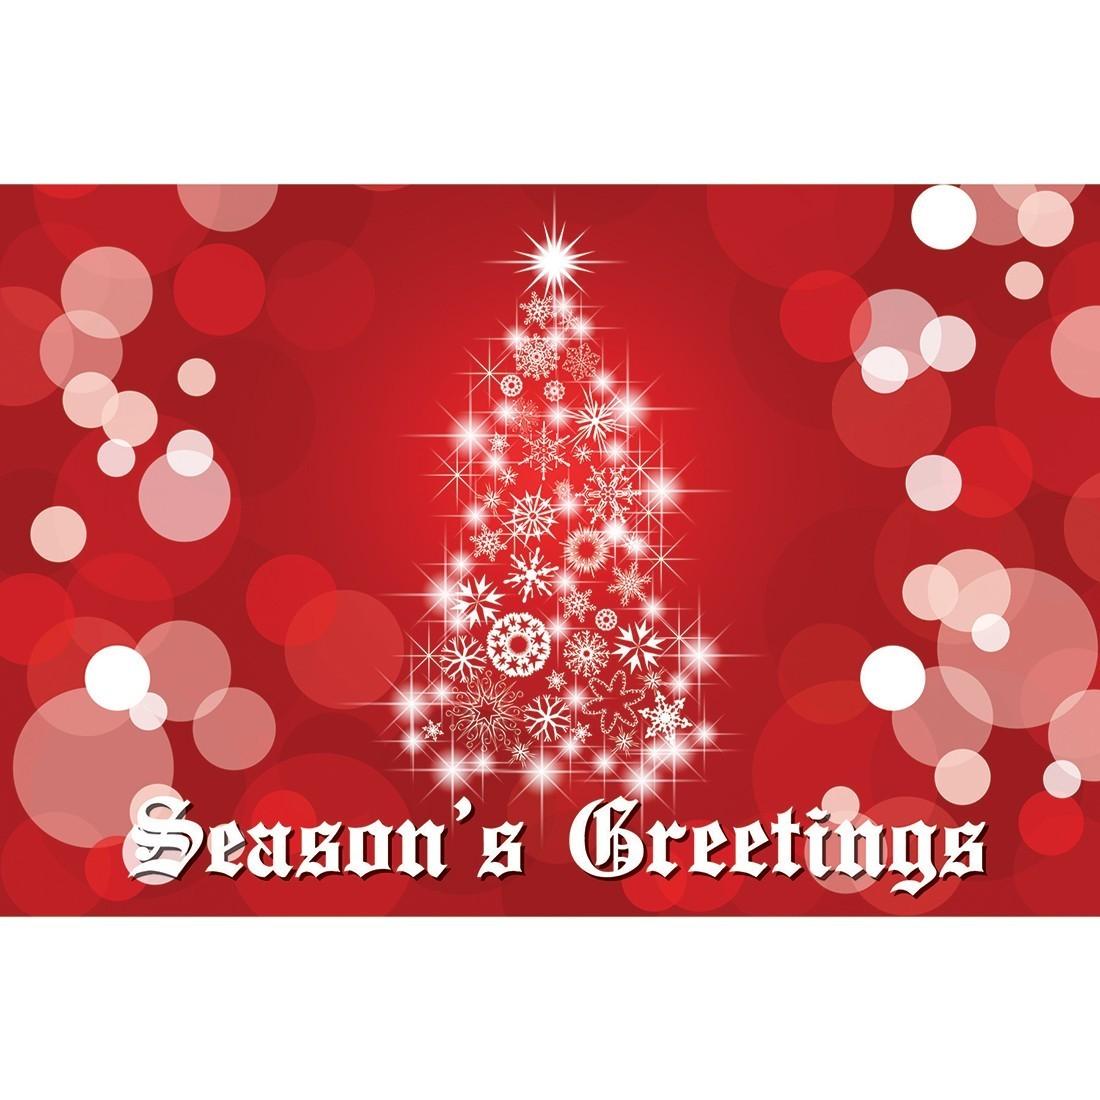 Seasons greetings greeting cards christmas greeting cards seasons greetings lit tree greeting cards m4hsunfo